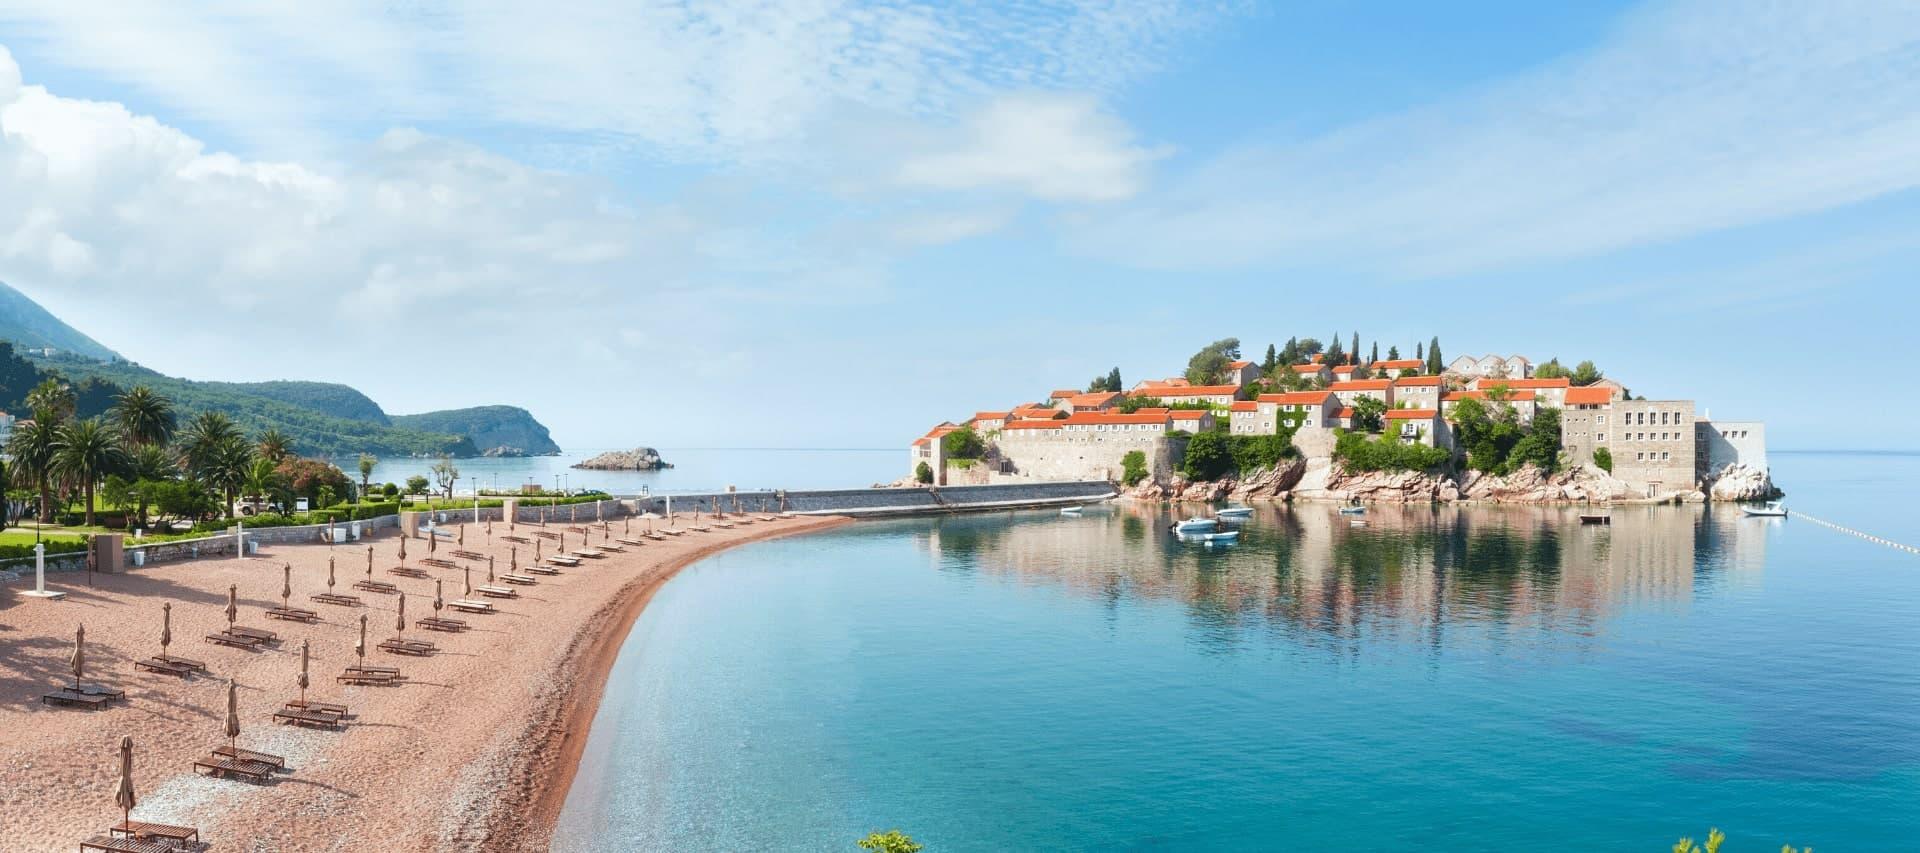 The beach at Sveti Stefan, Montenegro